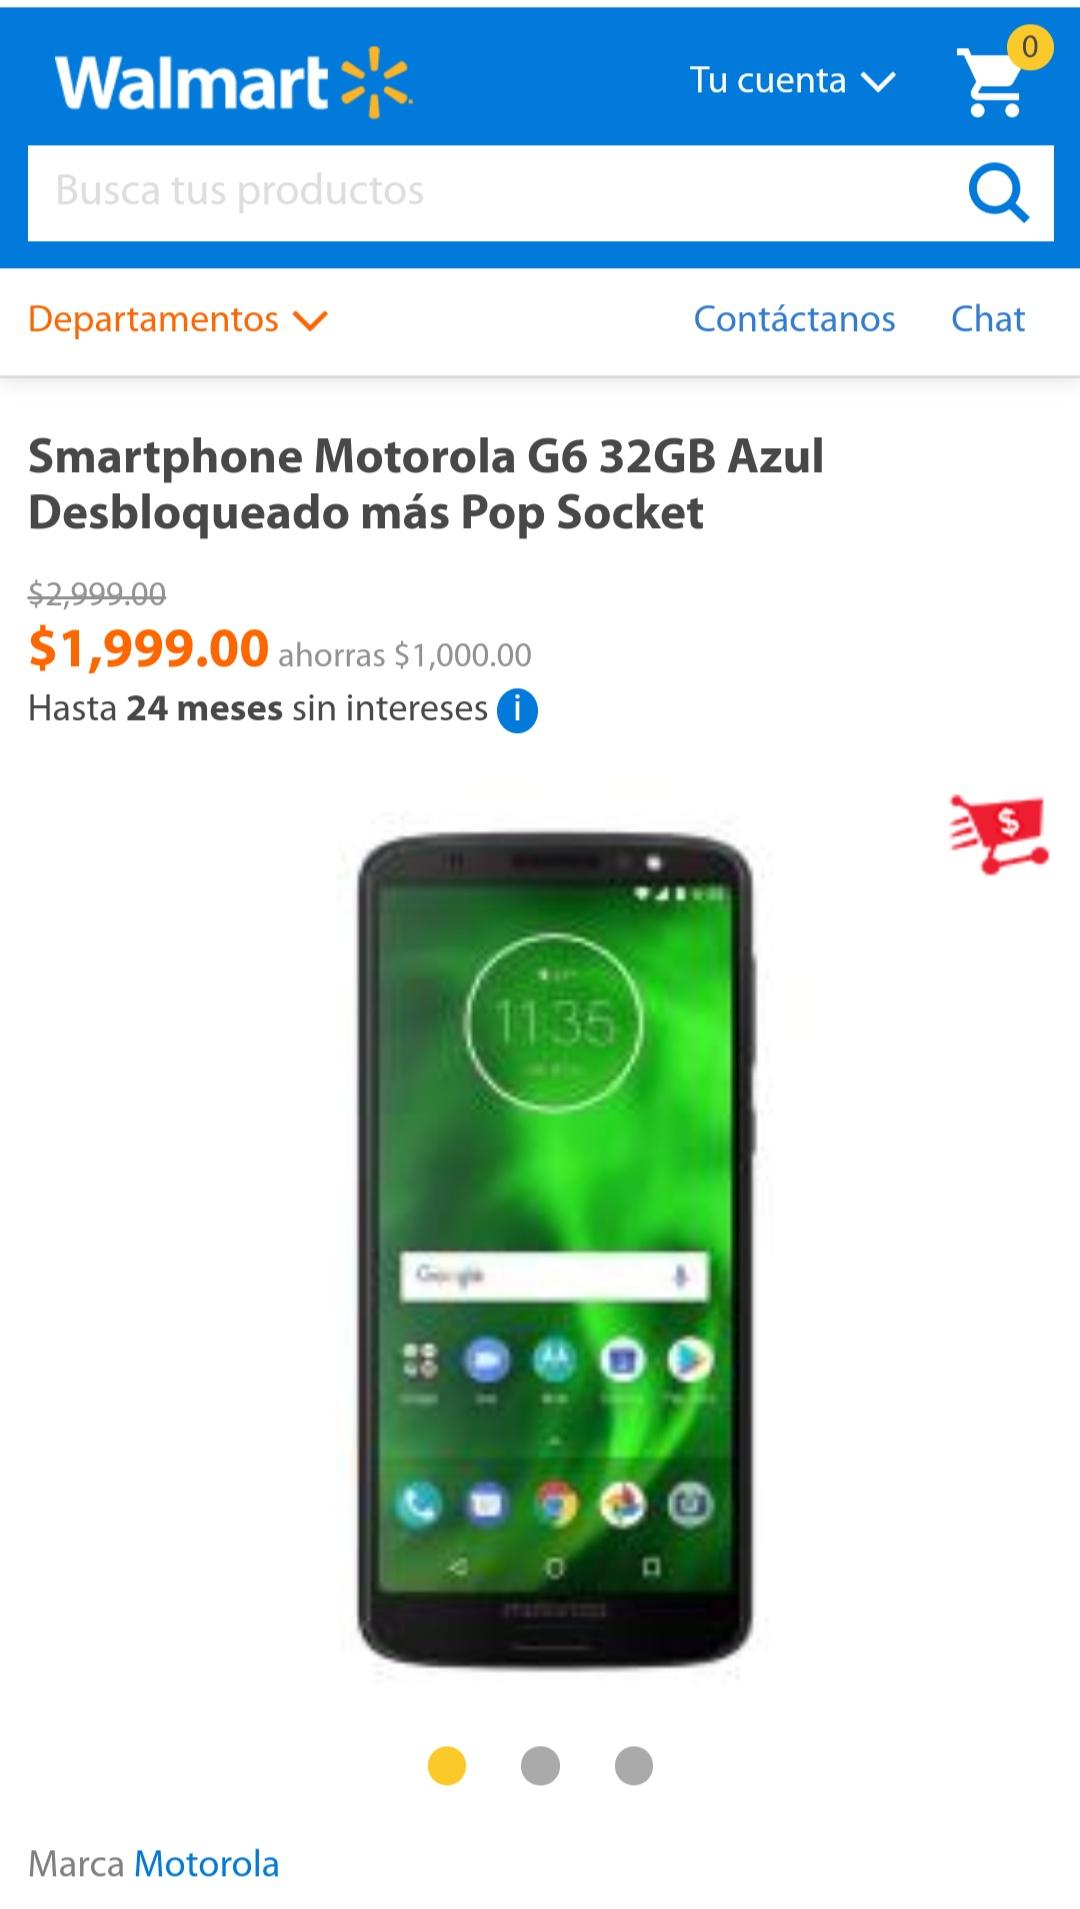 Walmart en línea: Moto G6